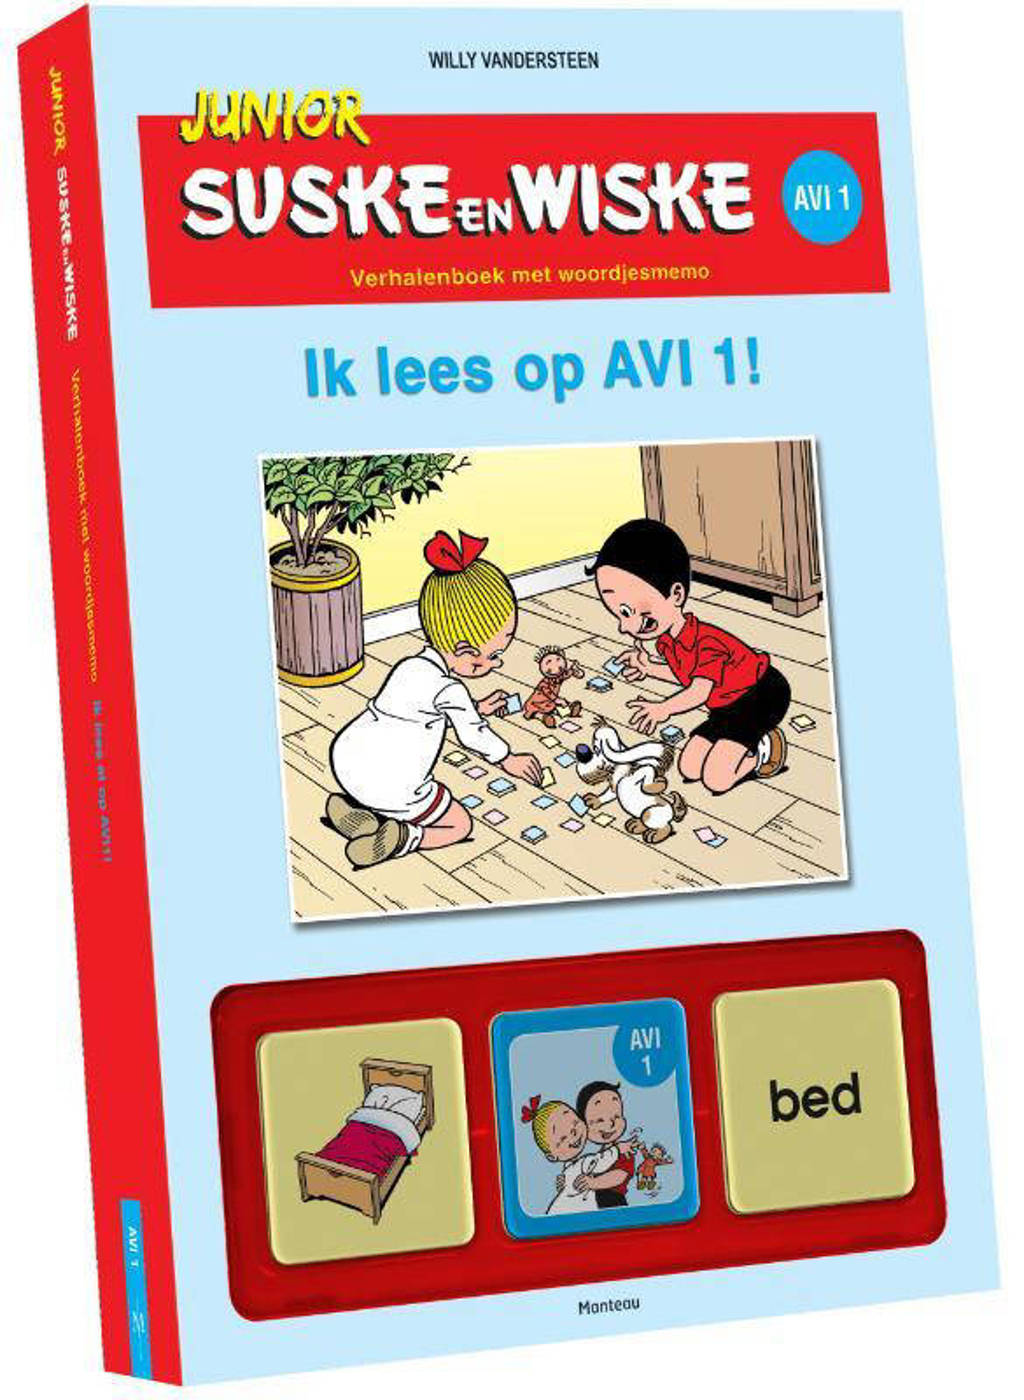 Junior Suske en Wiske: Ik lees op AVI 1 - Willy Vandersteen en Hetty van Aar